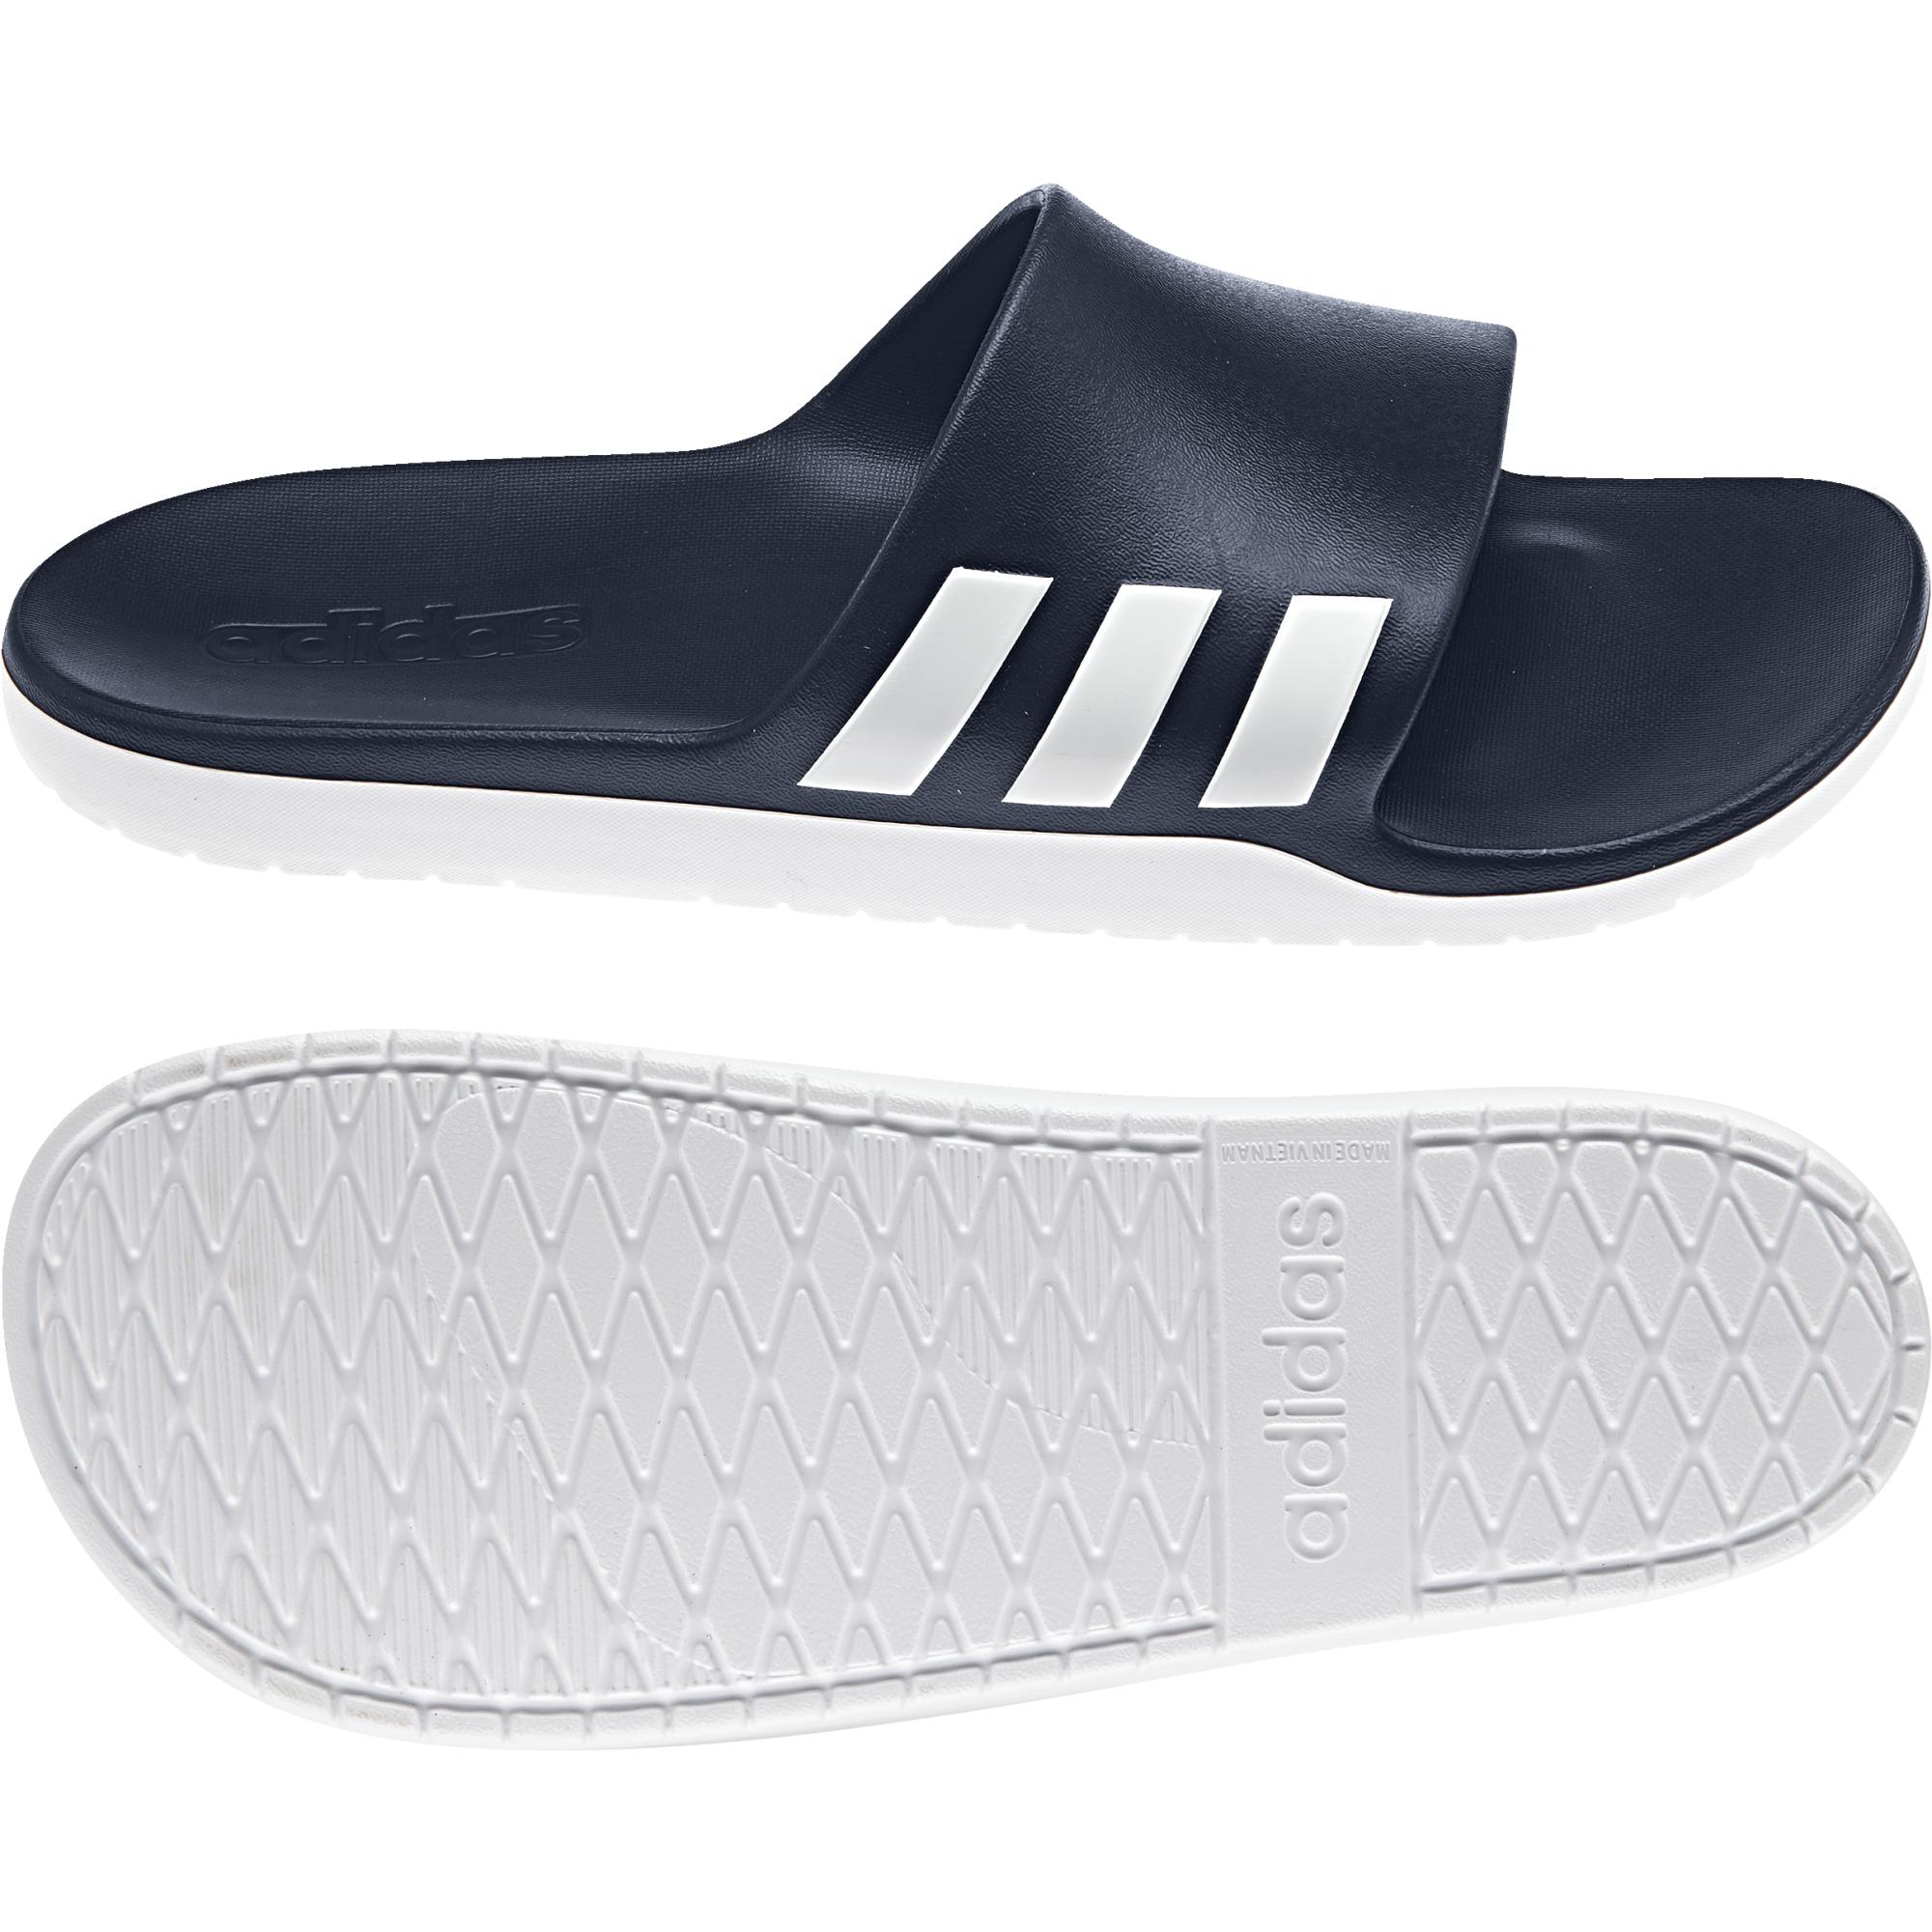 1133544595 Adidas Aqualette Cf férfi papucs , Férfi cipő | papucs | adidas_performance  | Adidas Aqualette Cf férfi papucs